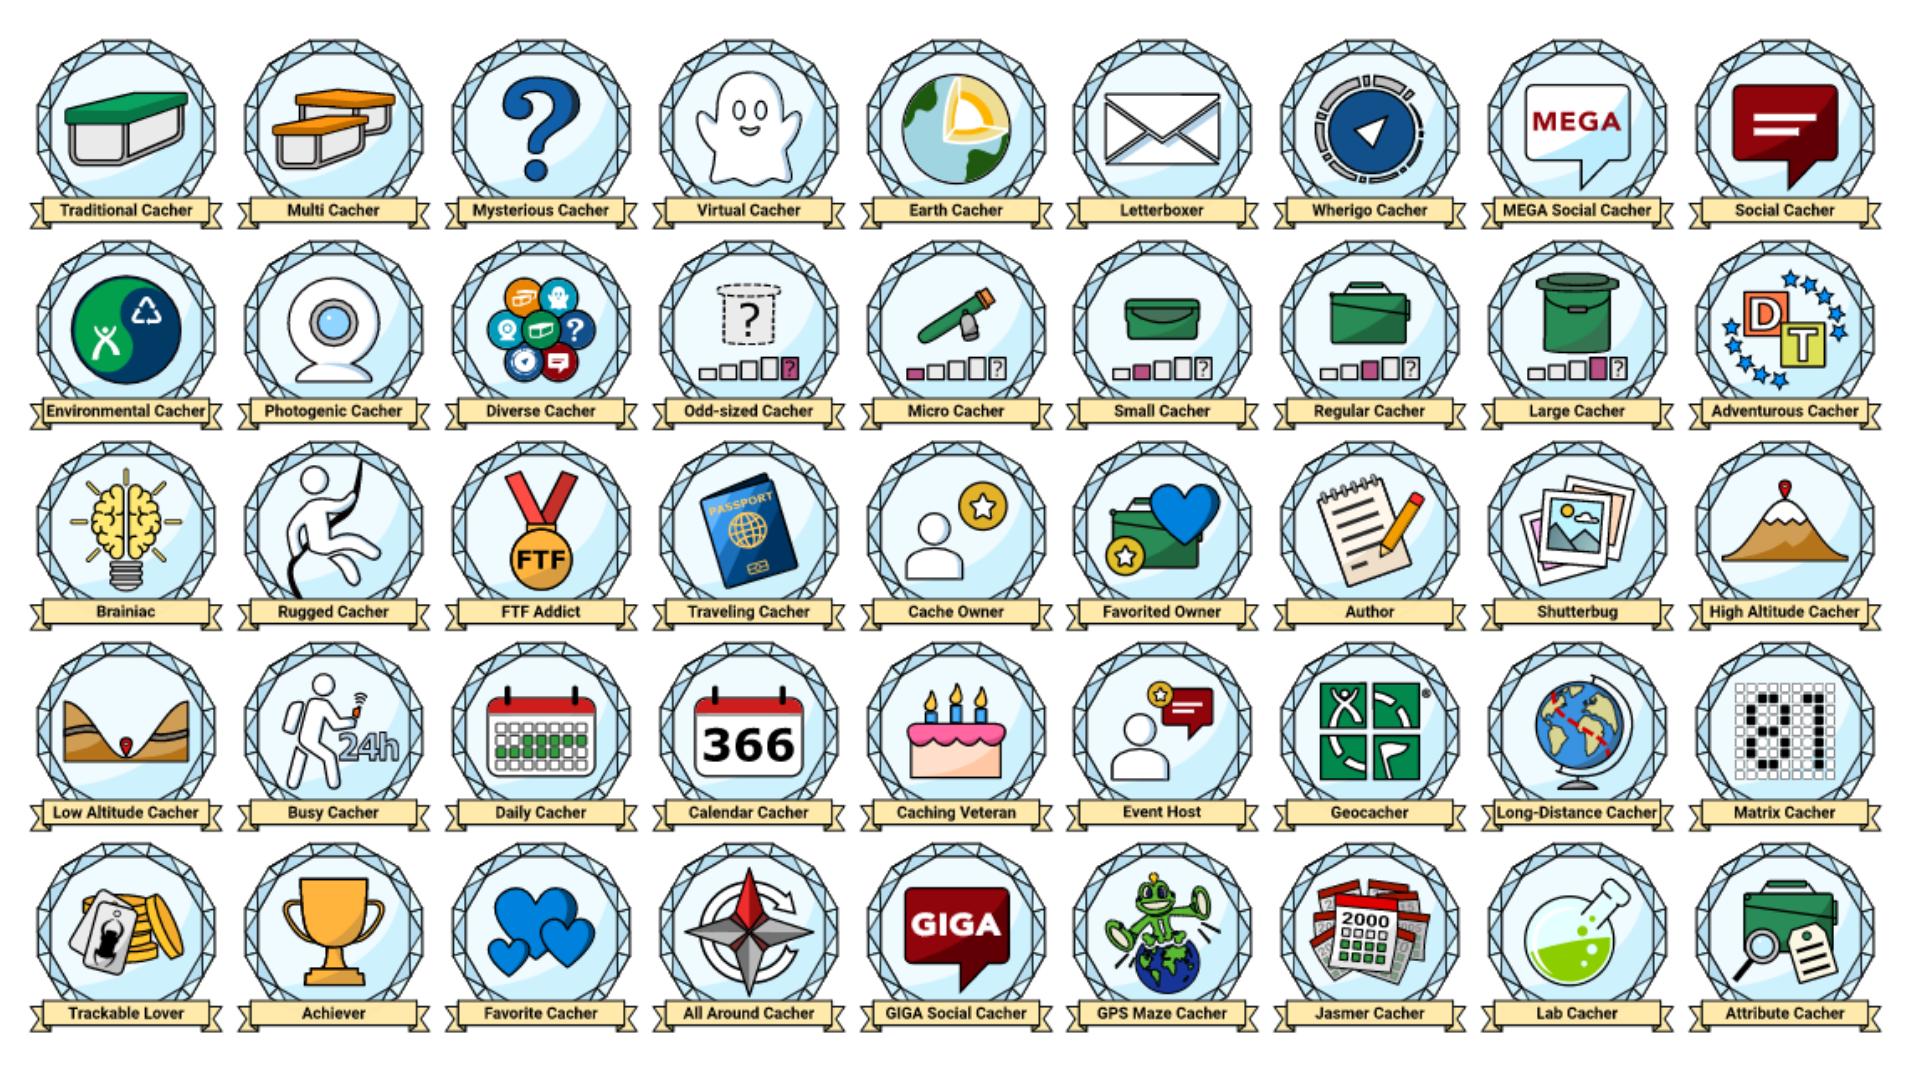 Geocaching badges